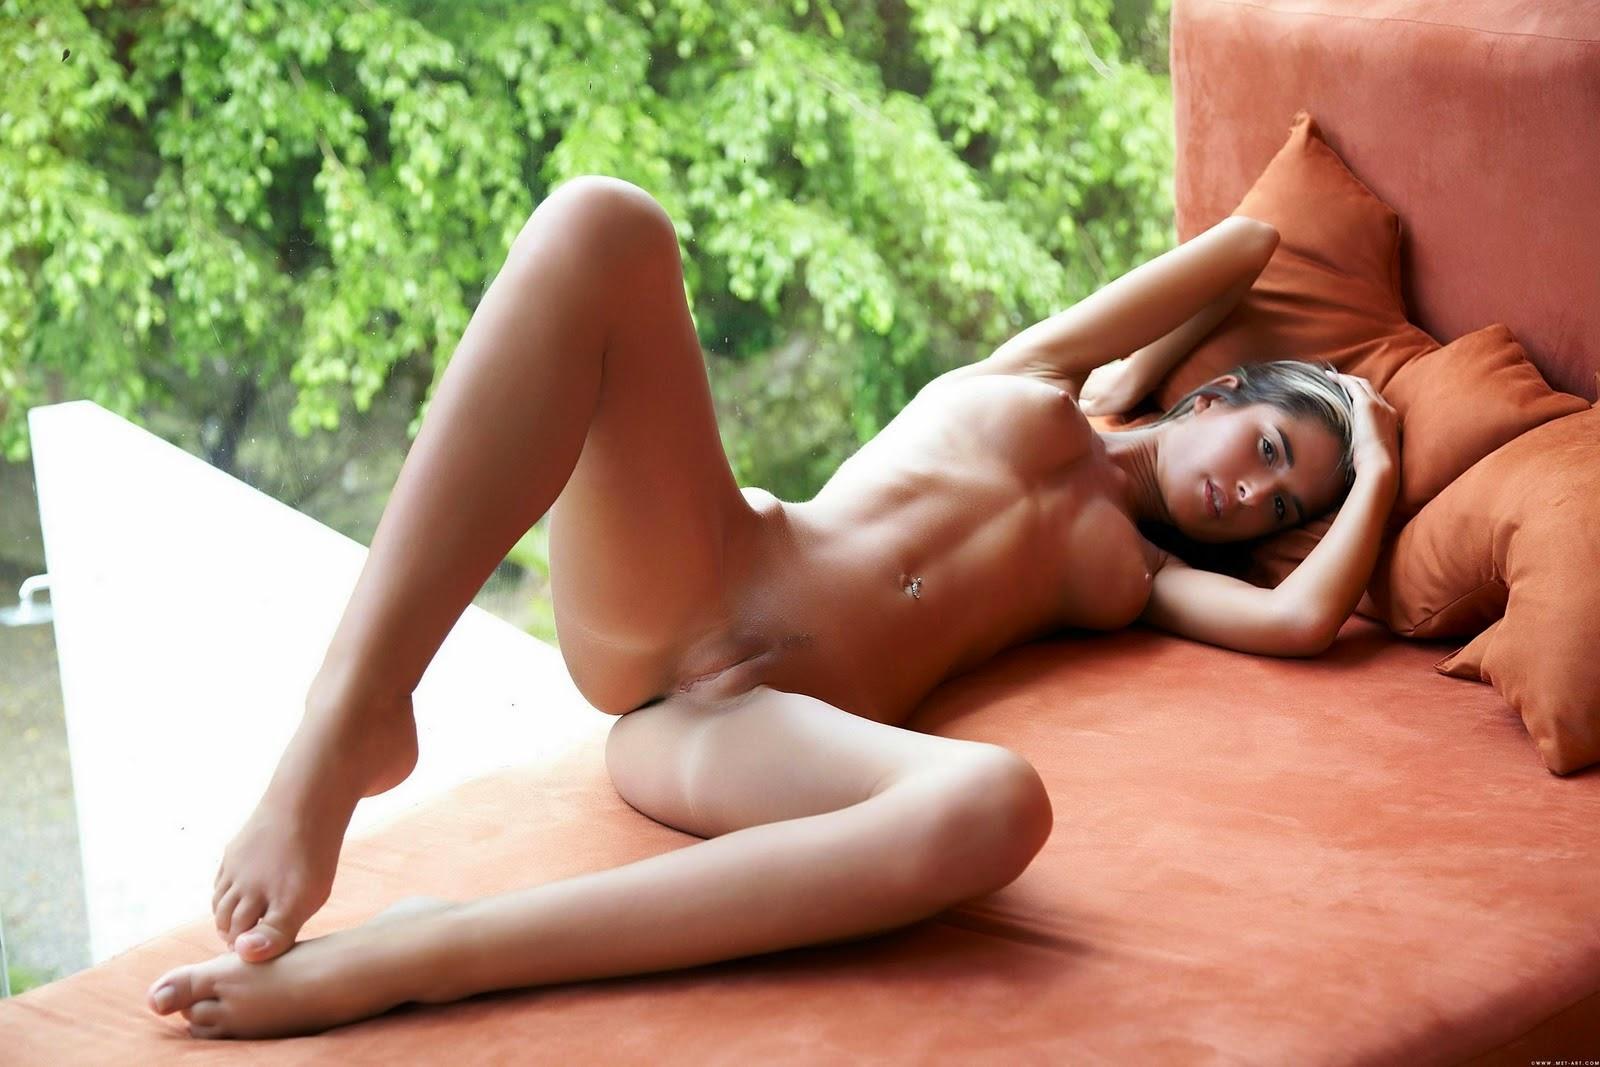 Hot Girls Wallpapers - Full HD wallpaper search